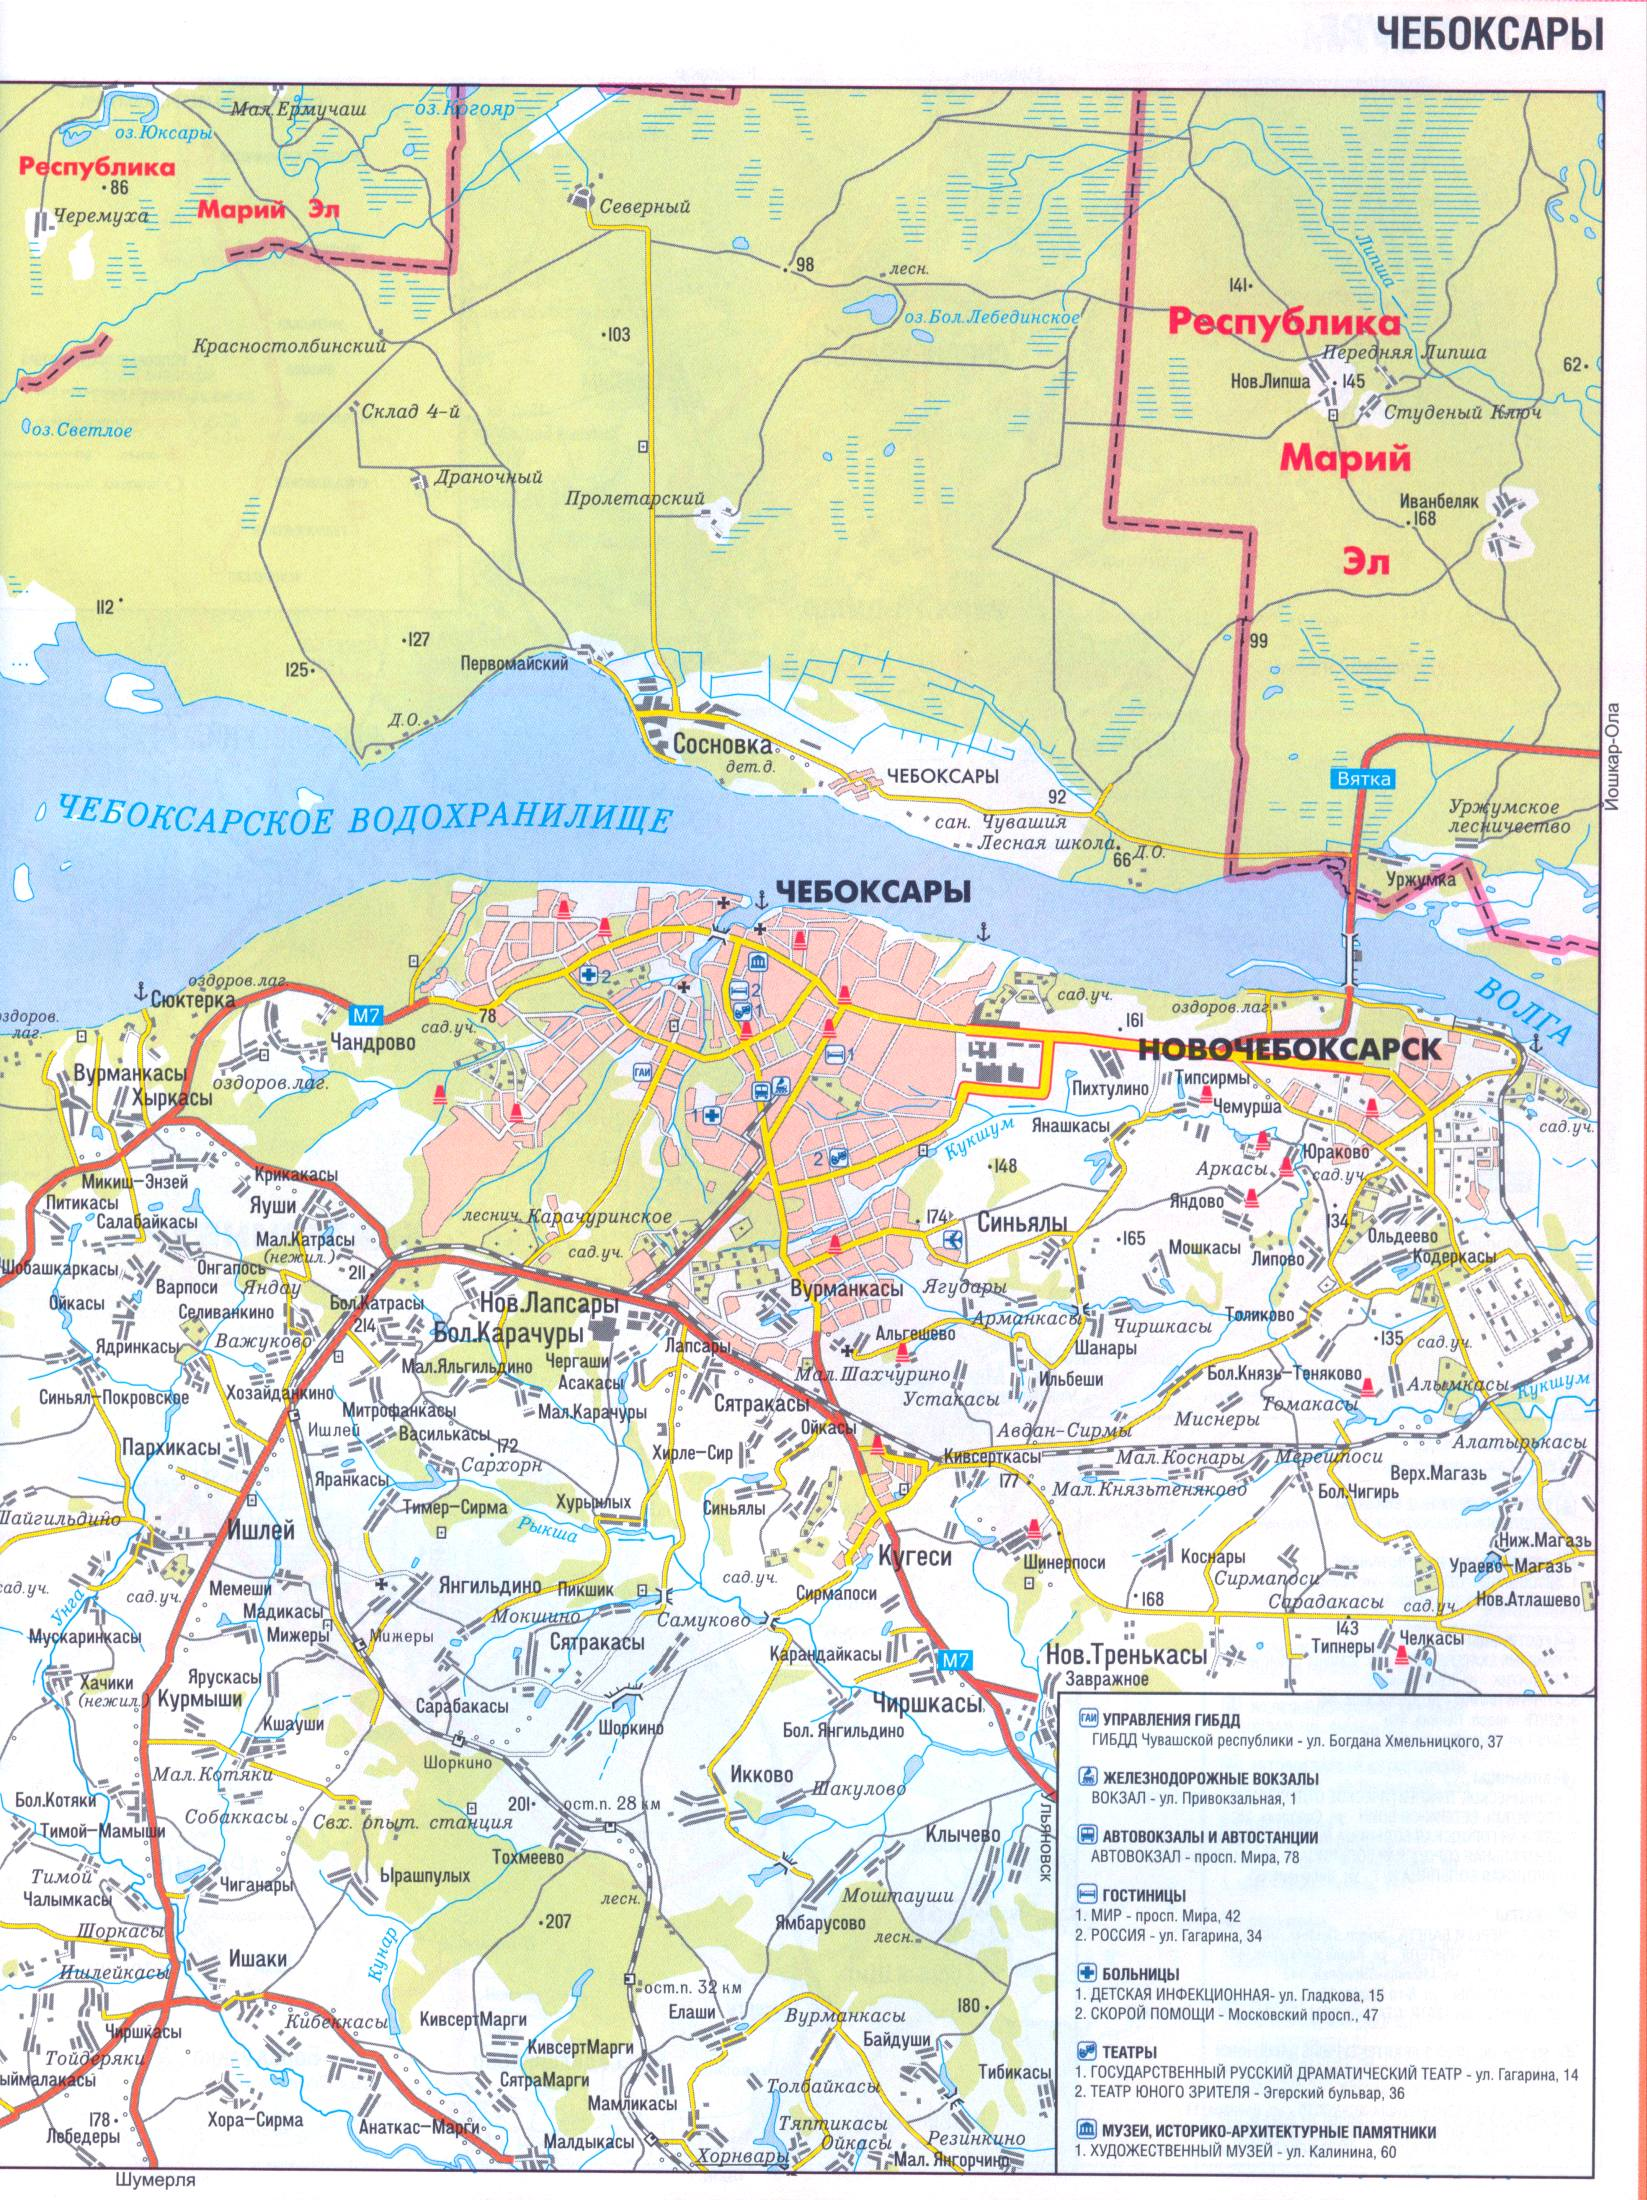 План карта города Чебоксары, схема проезда.